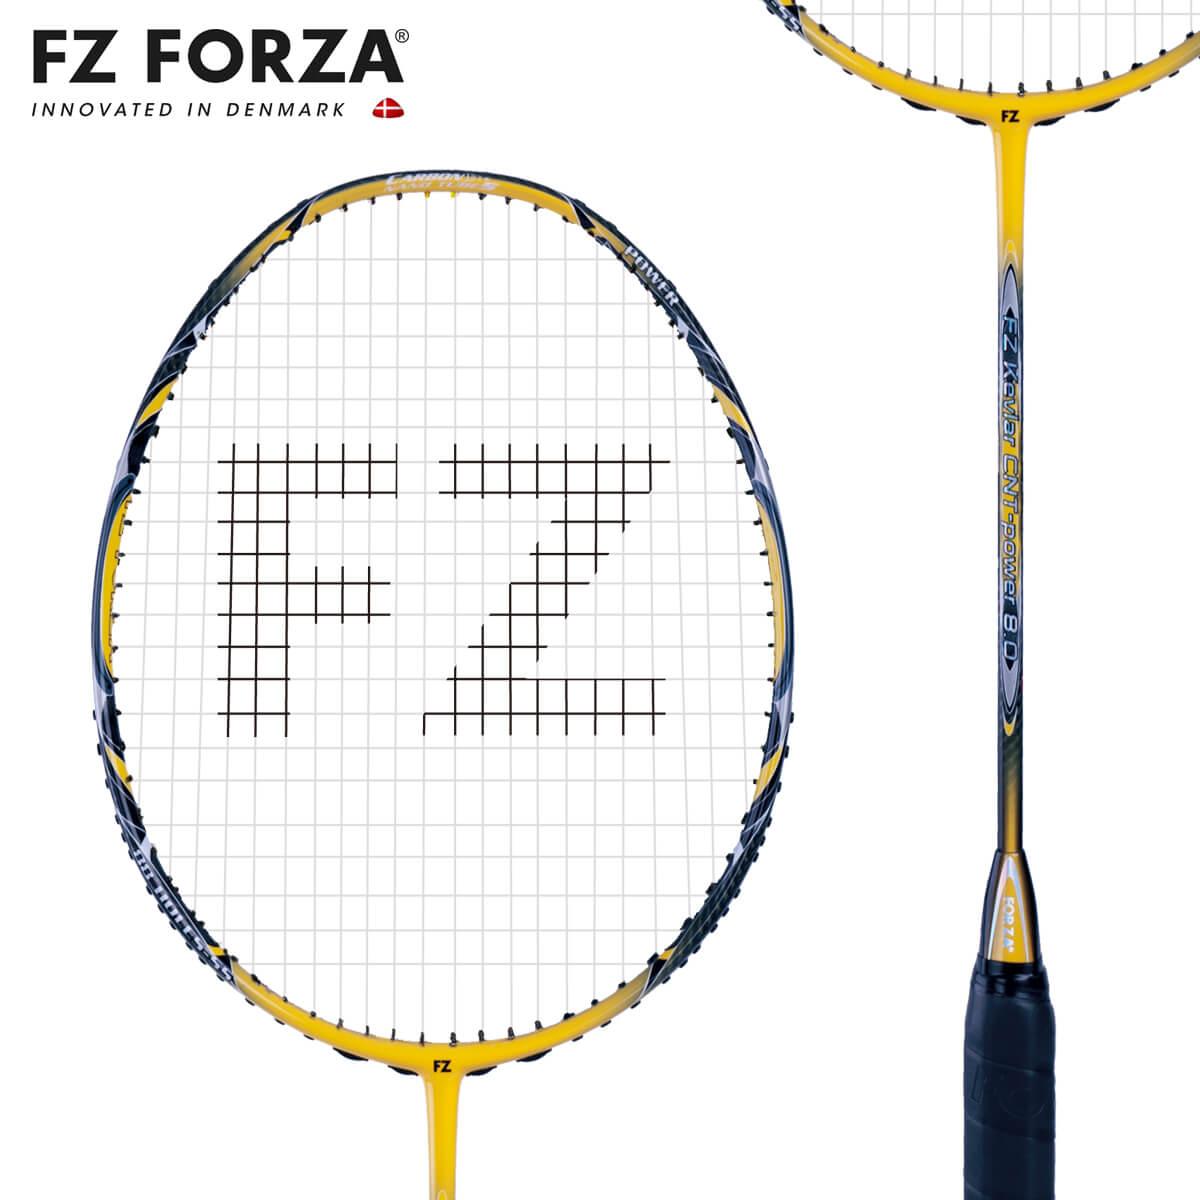 FZ FORZA Kevlar CNT-power 8.0 88ホール FZ フォーザ バドミントンラケット【オススメガット&ガット張り工賃無料】